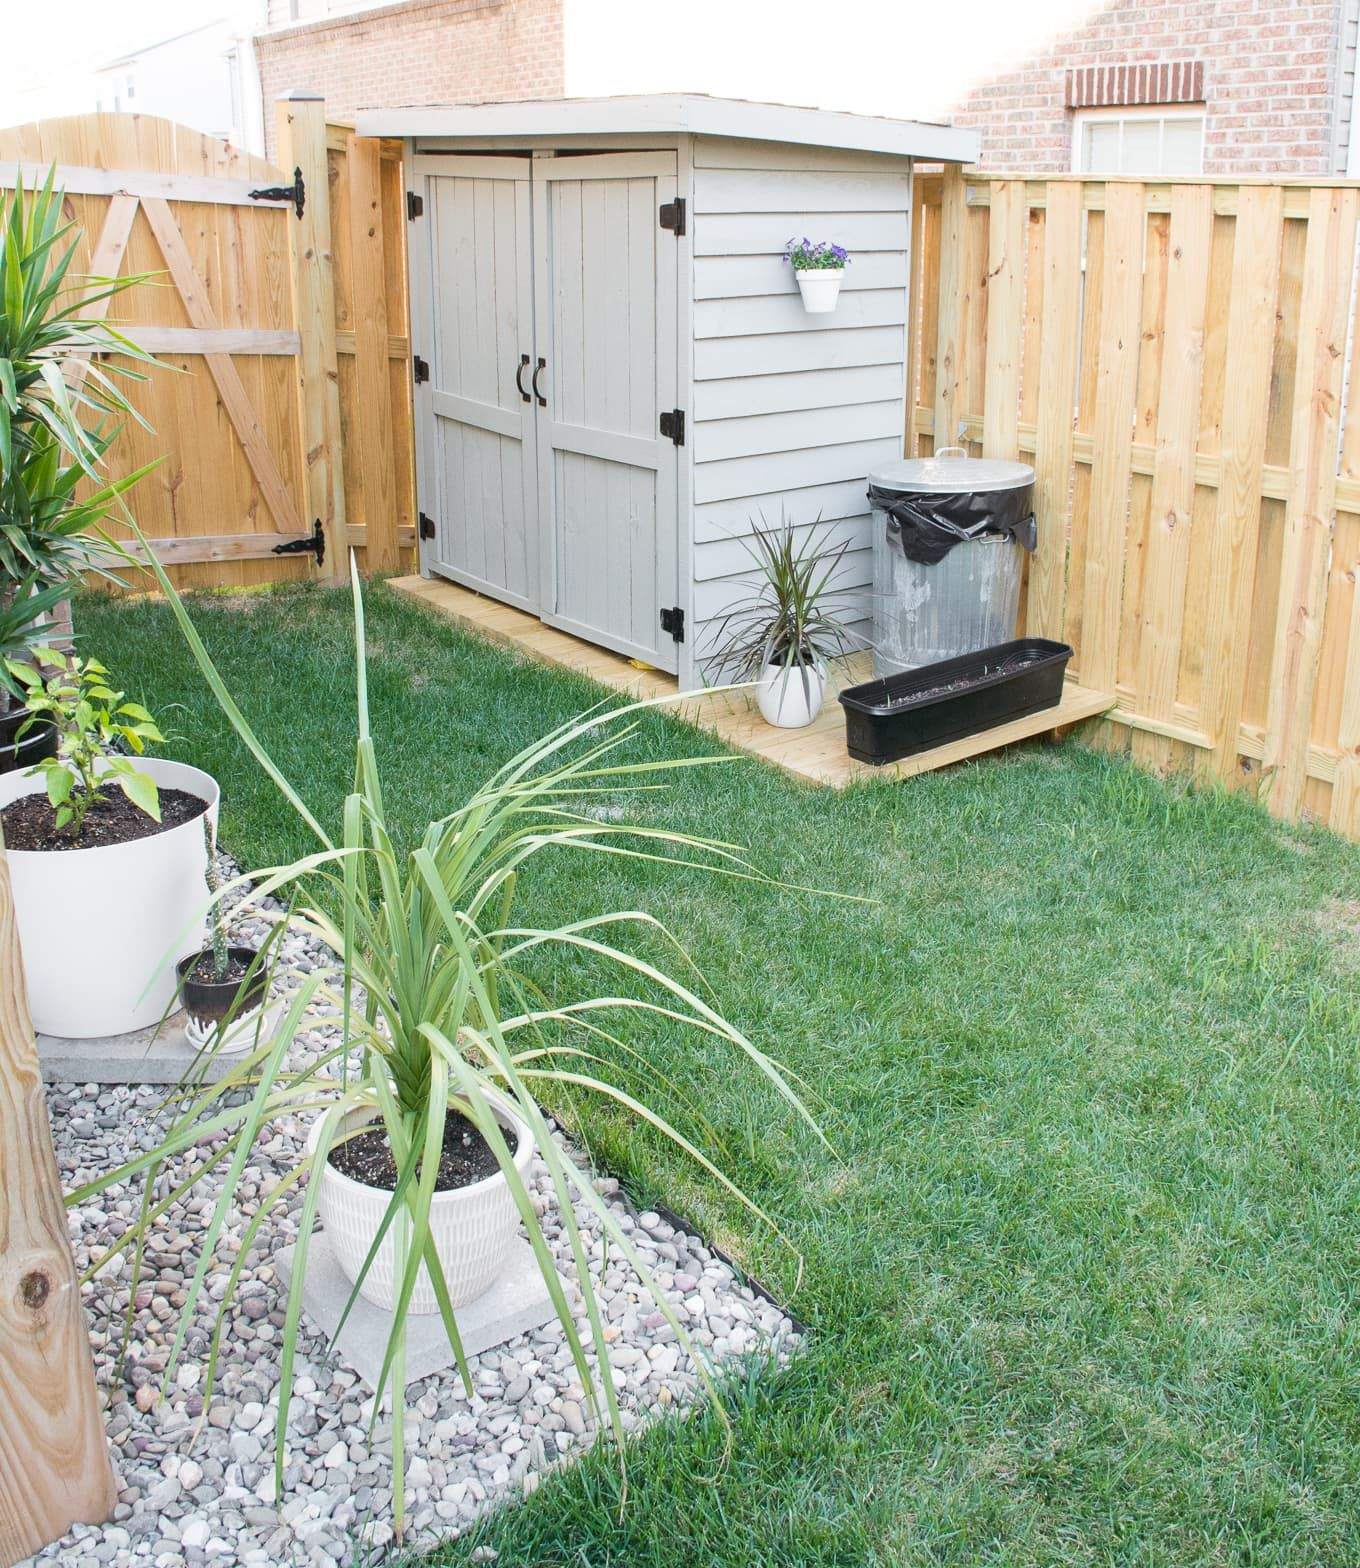 Tiny Backyard Ideas An Update On My Tiny Backyard Garden Small Backyard Landscaping Small Backyard Gardens Backyard